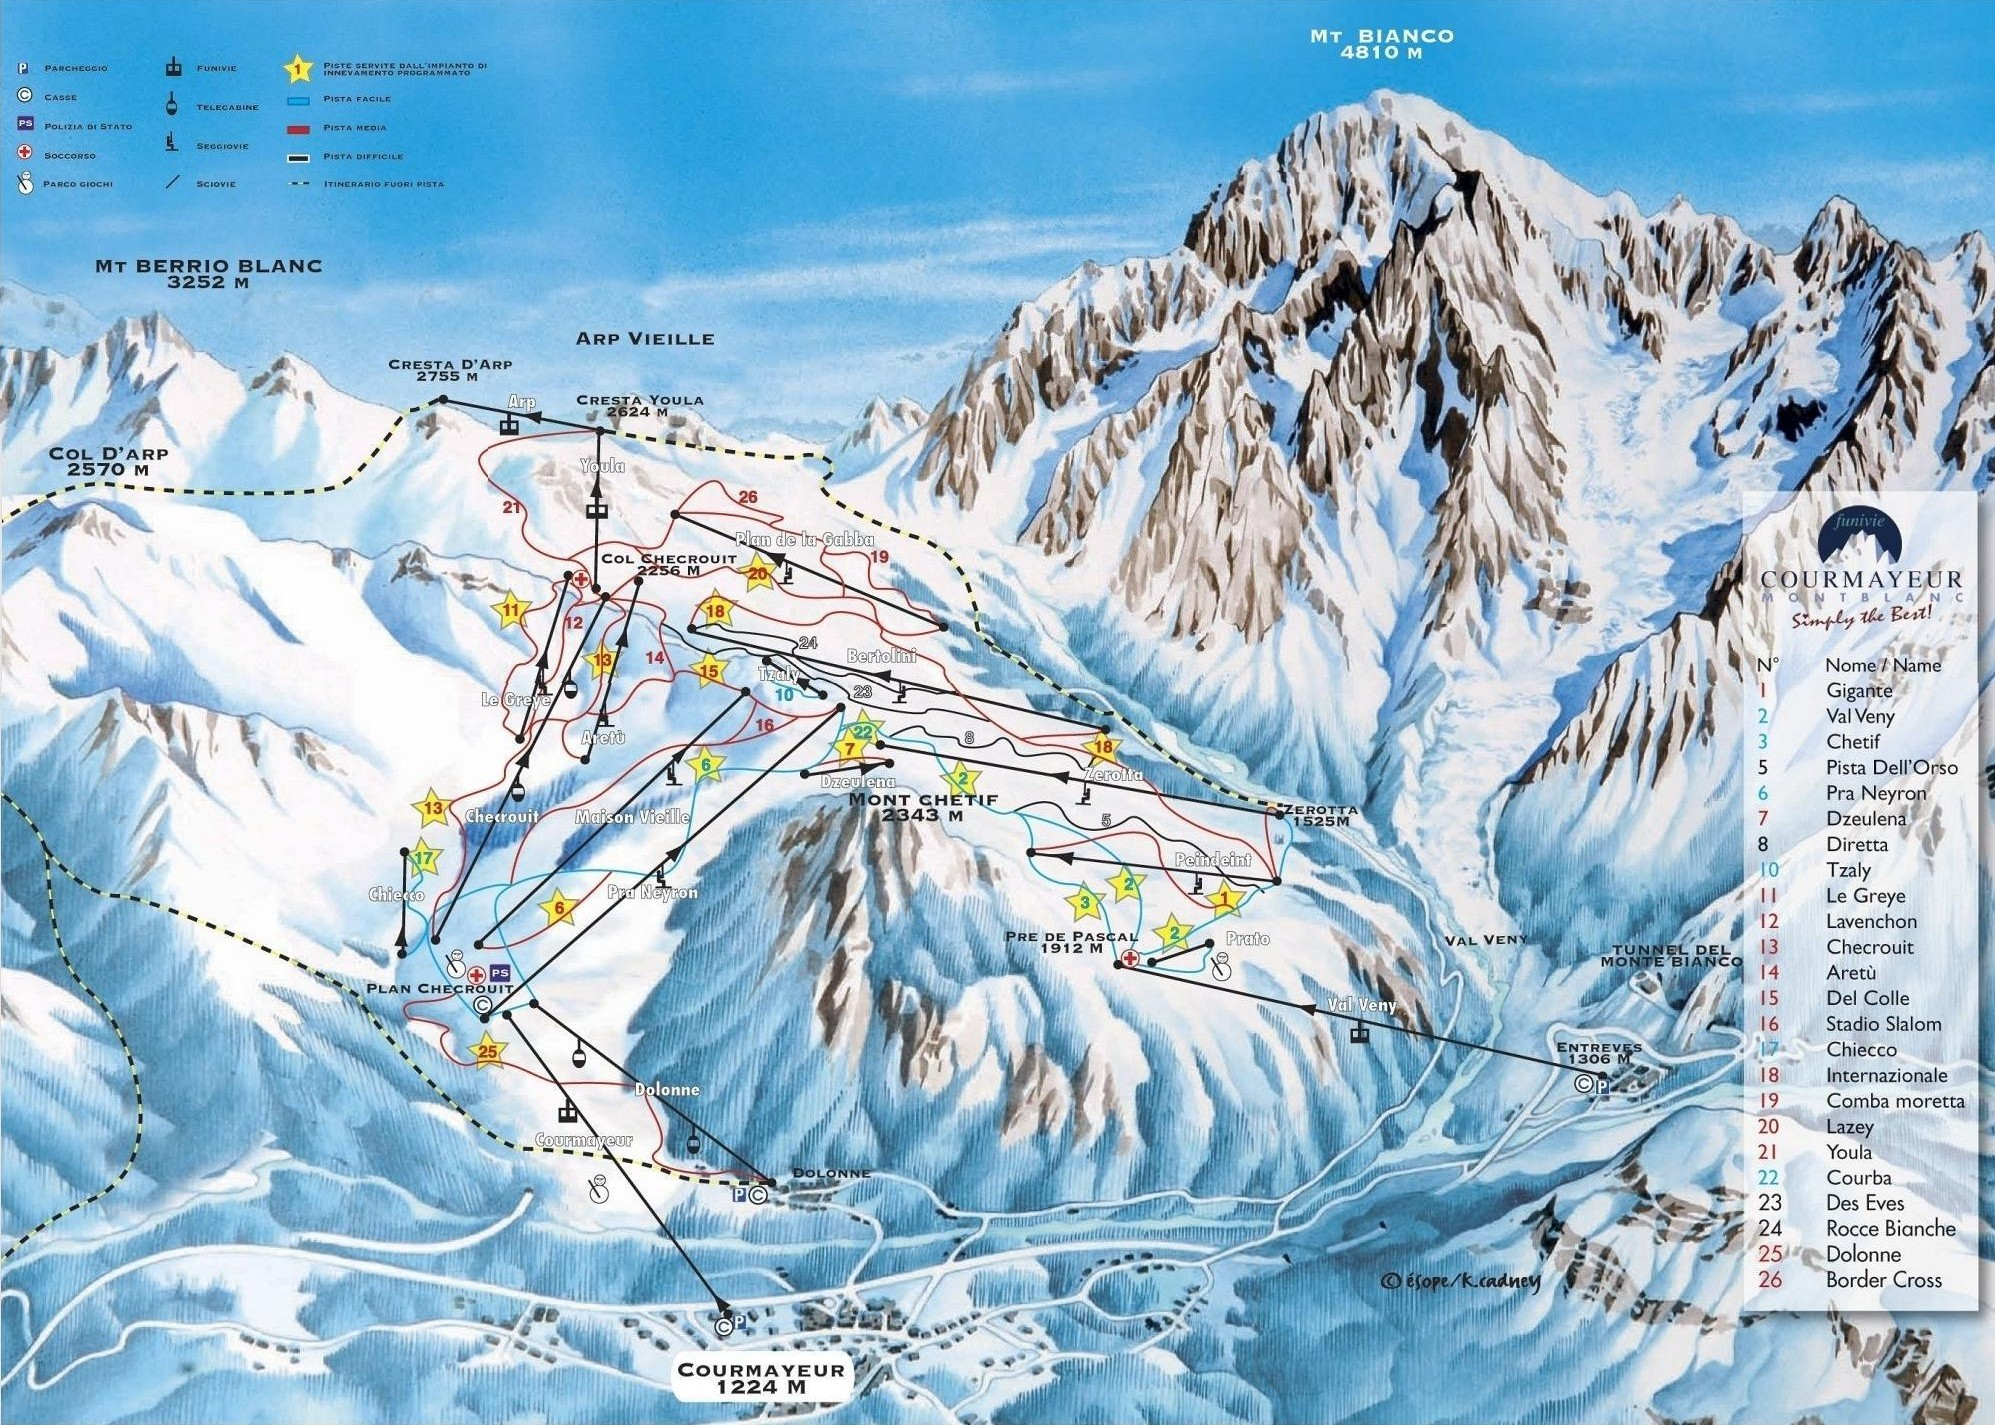 Lyžařská mapa sjezdovek areálu Courmayeur / Monte Bianco